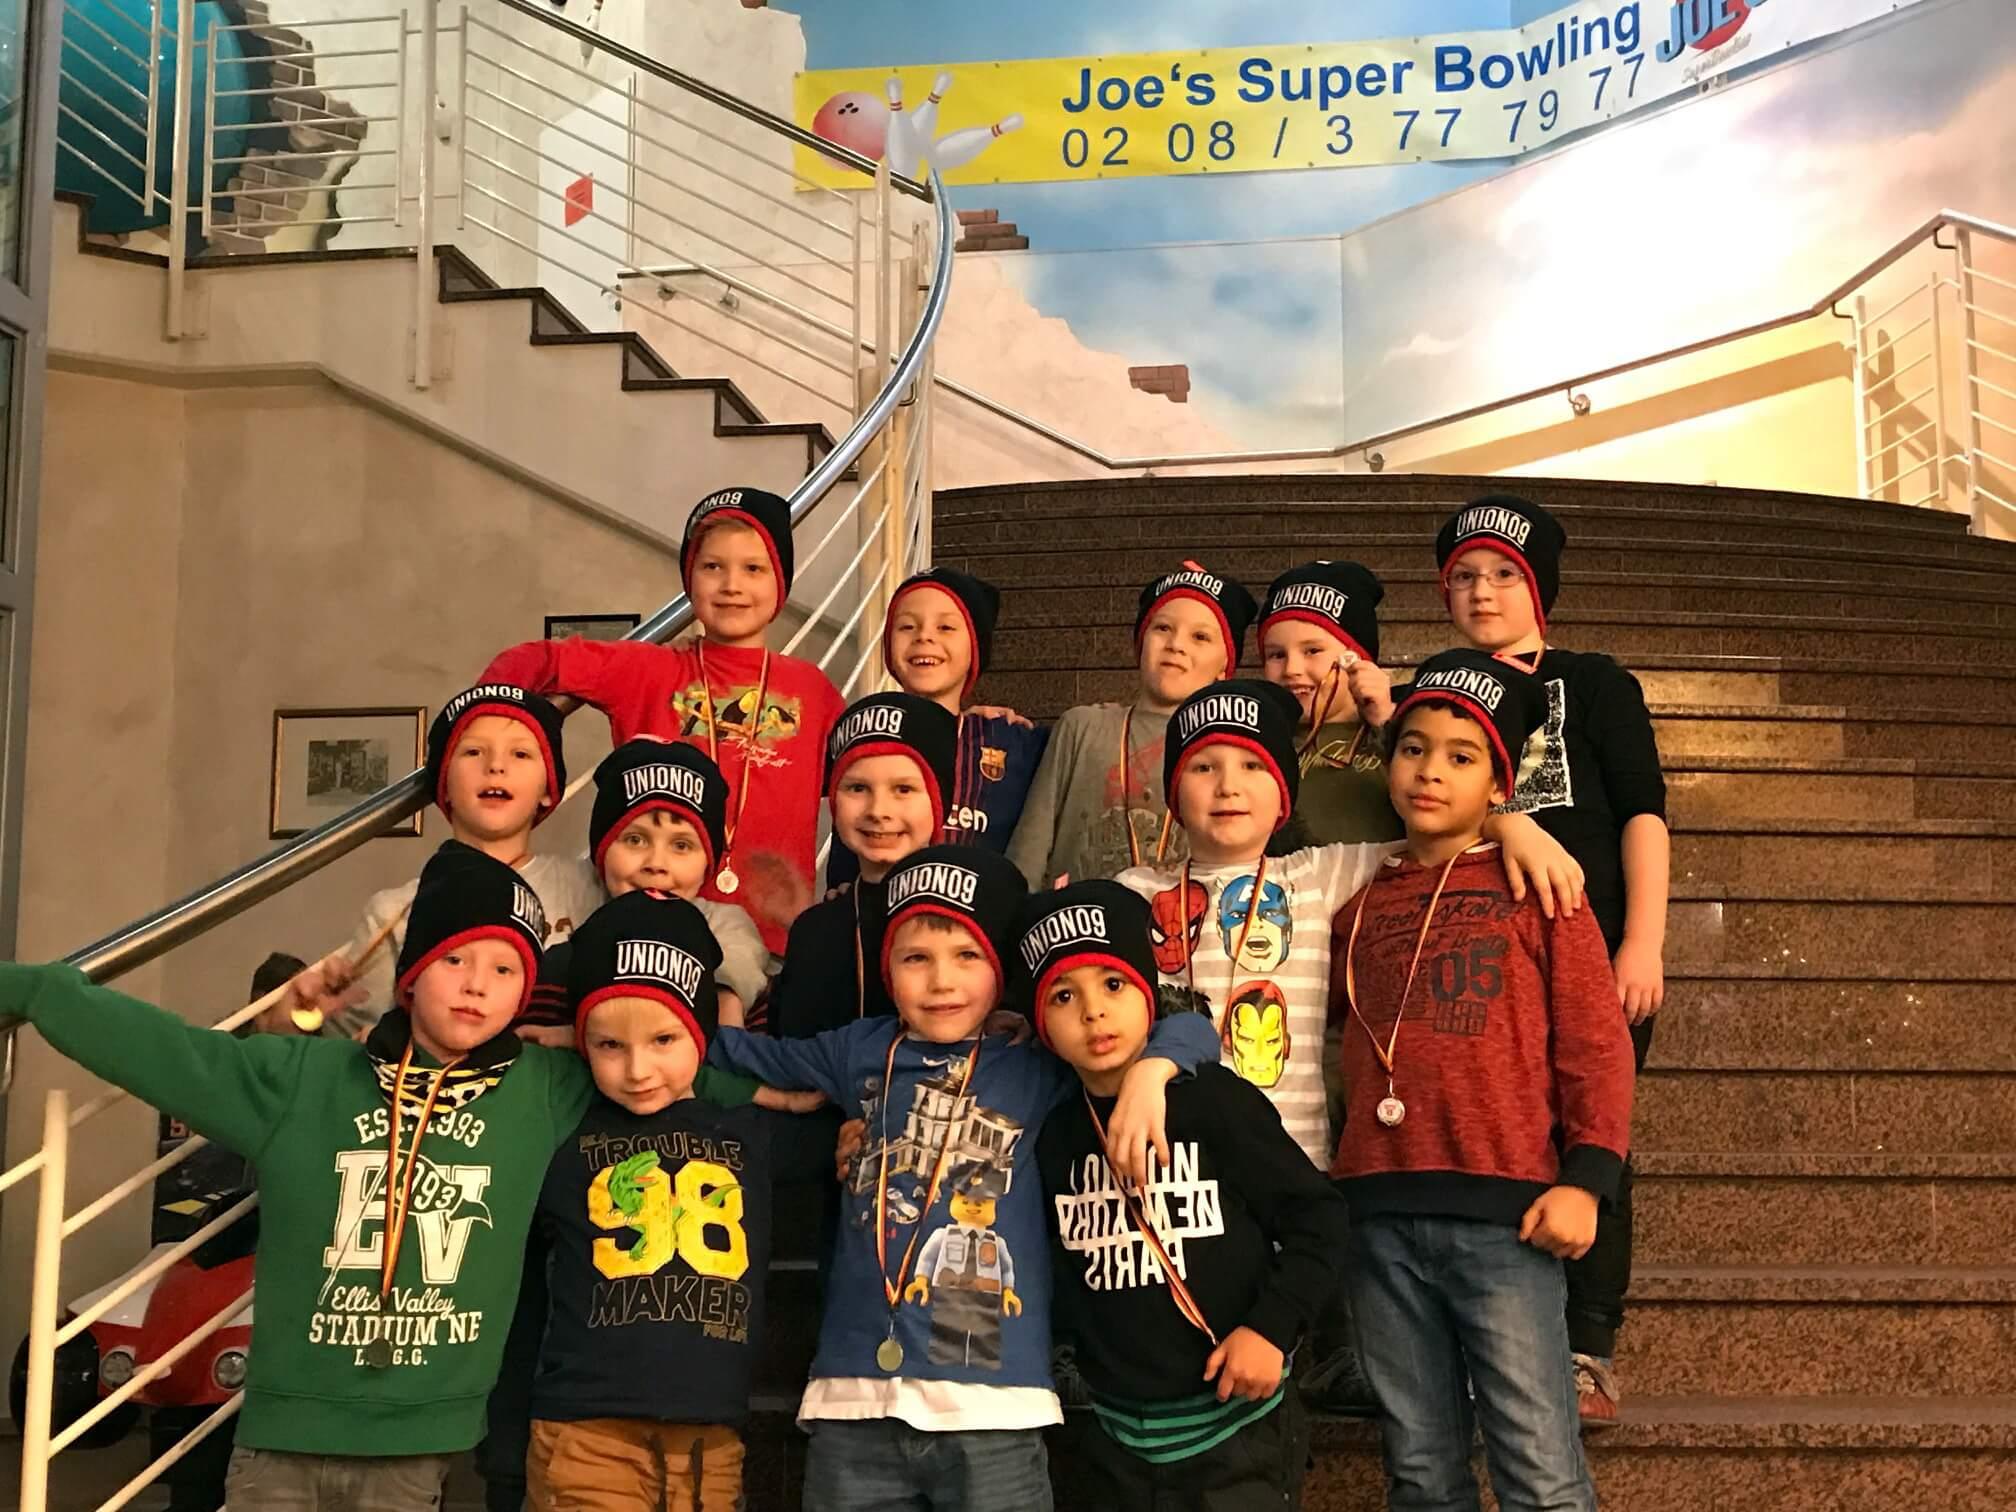 Bambinis feiern im Joe's Bowling Center